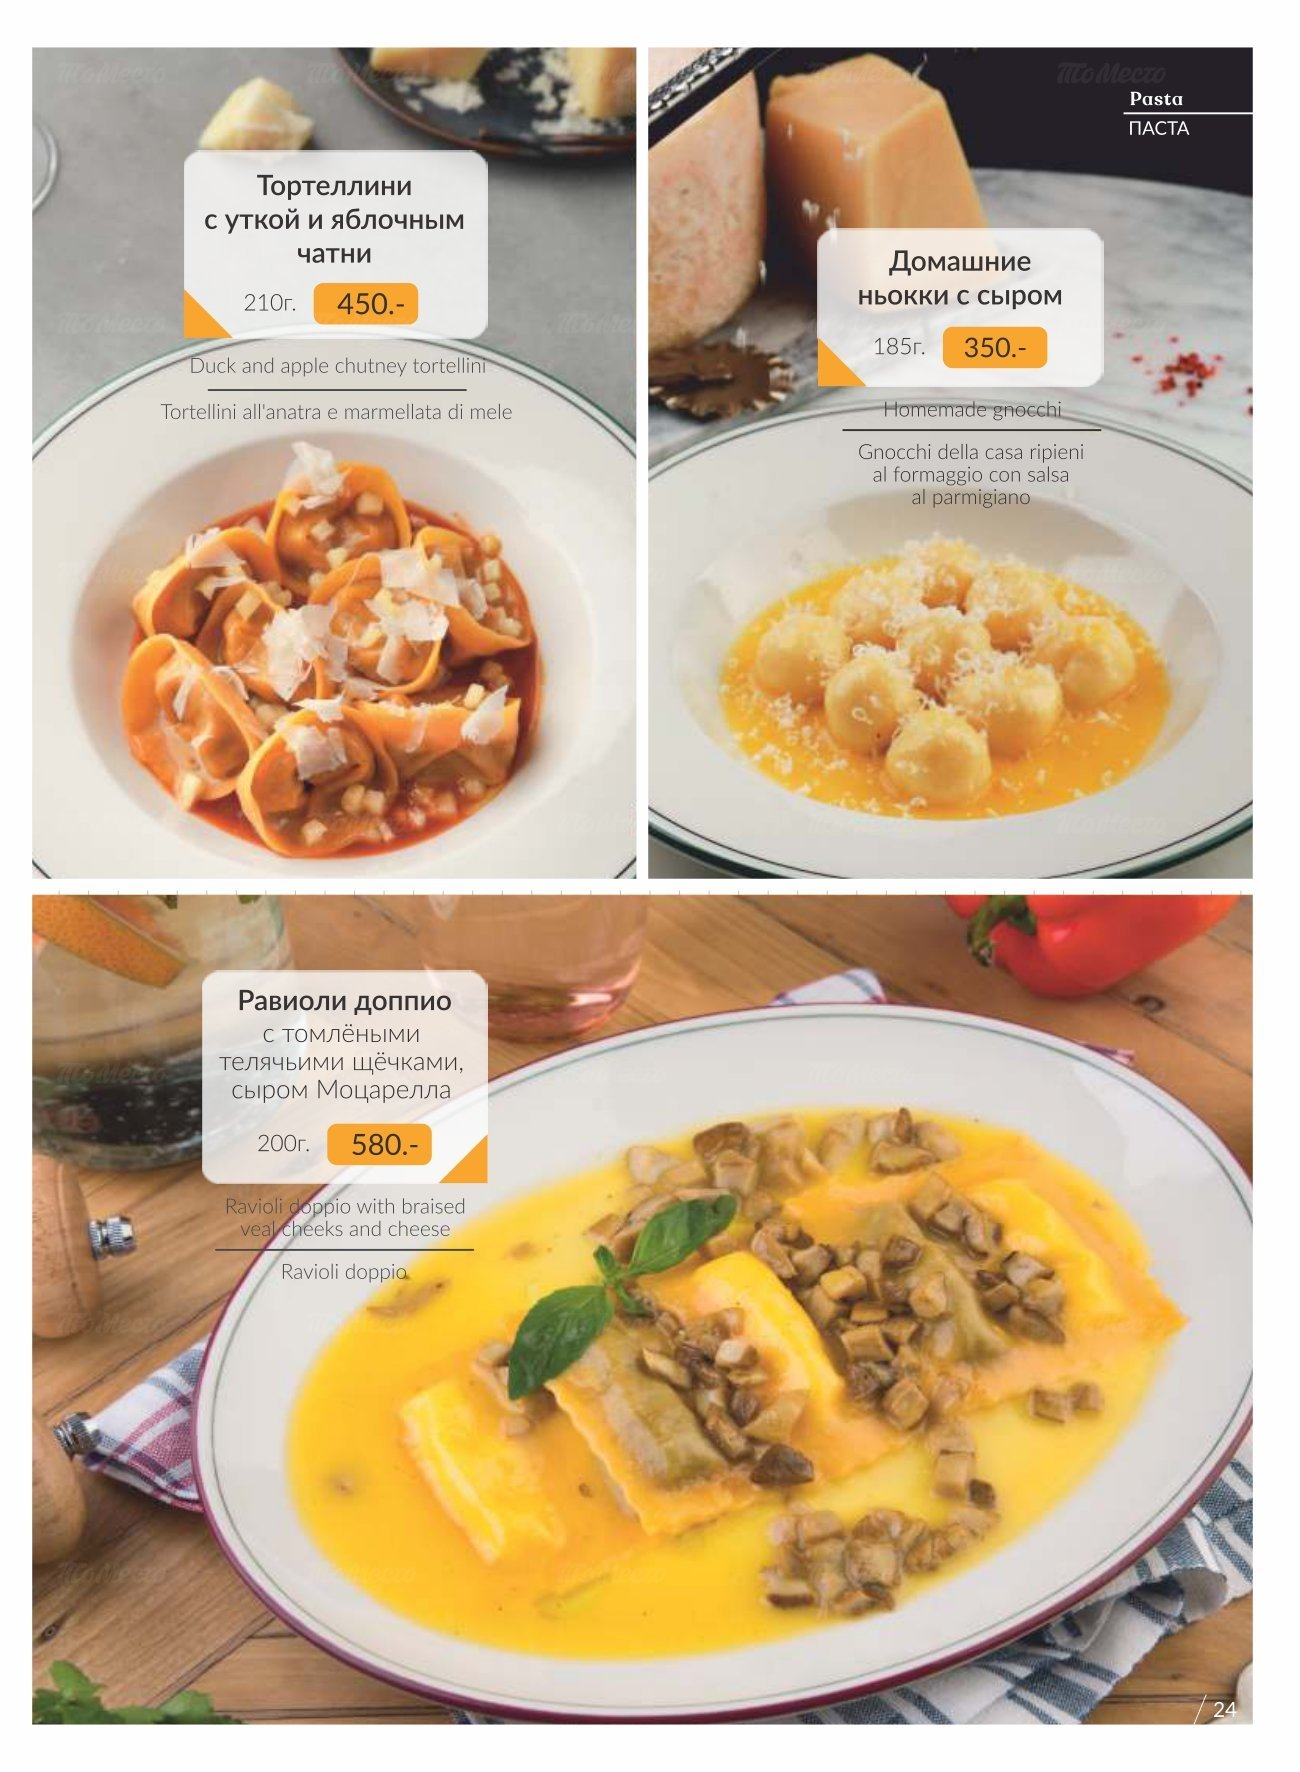 Меню ресторана Pinzeria by Bontempi (Пинцерия Бонтемпи) на Верх-Исетском бульваре фото 20